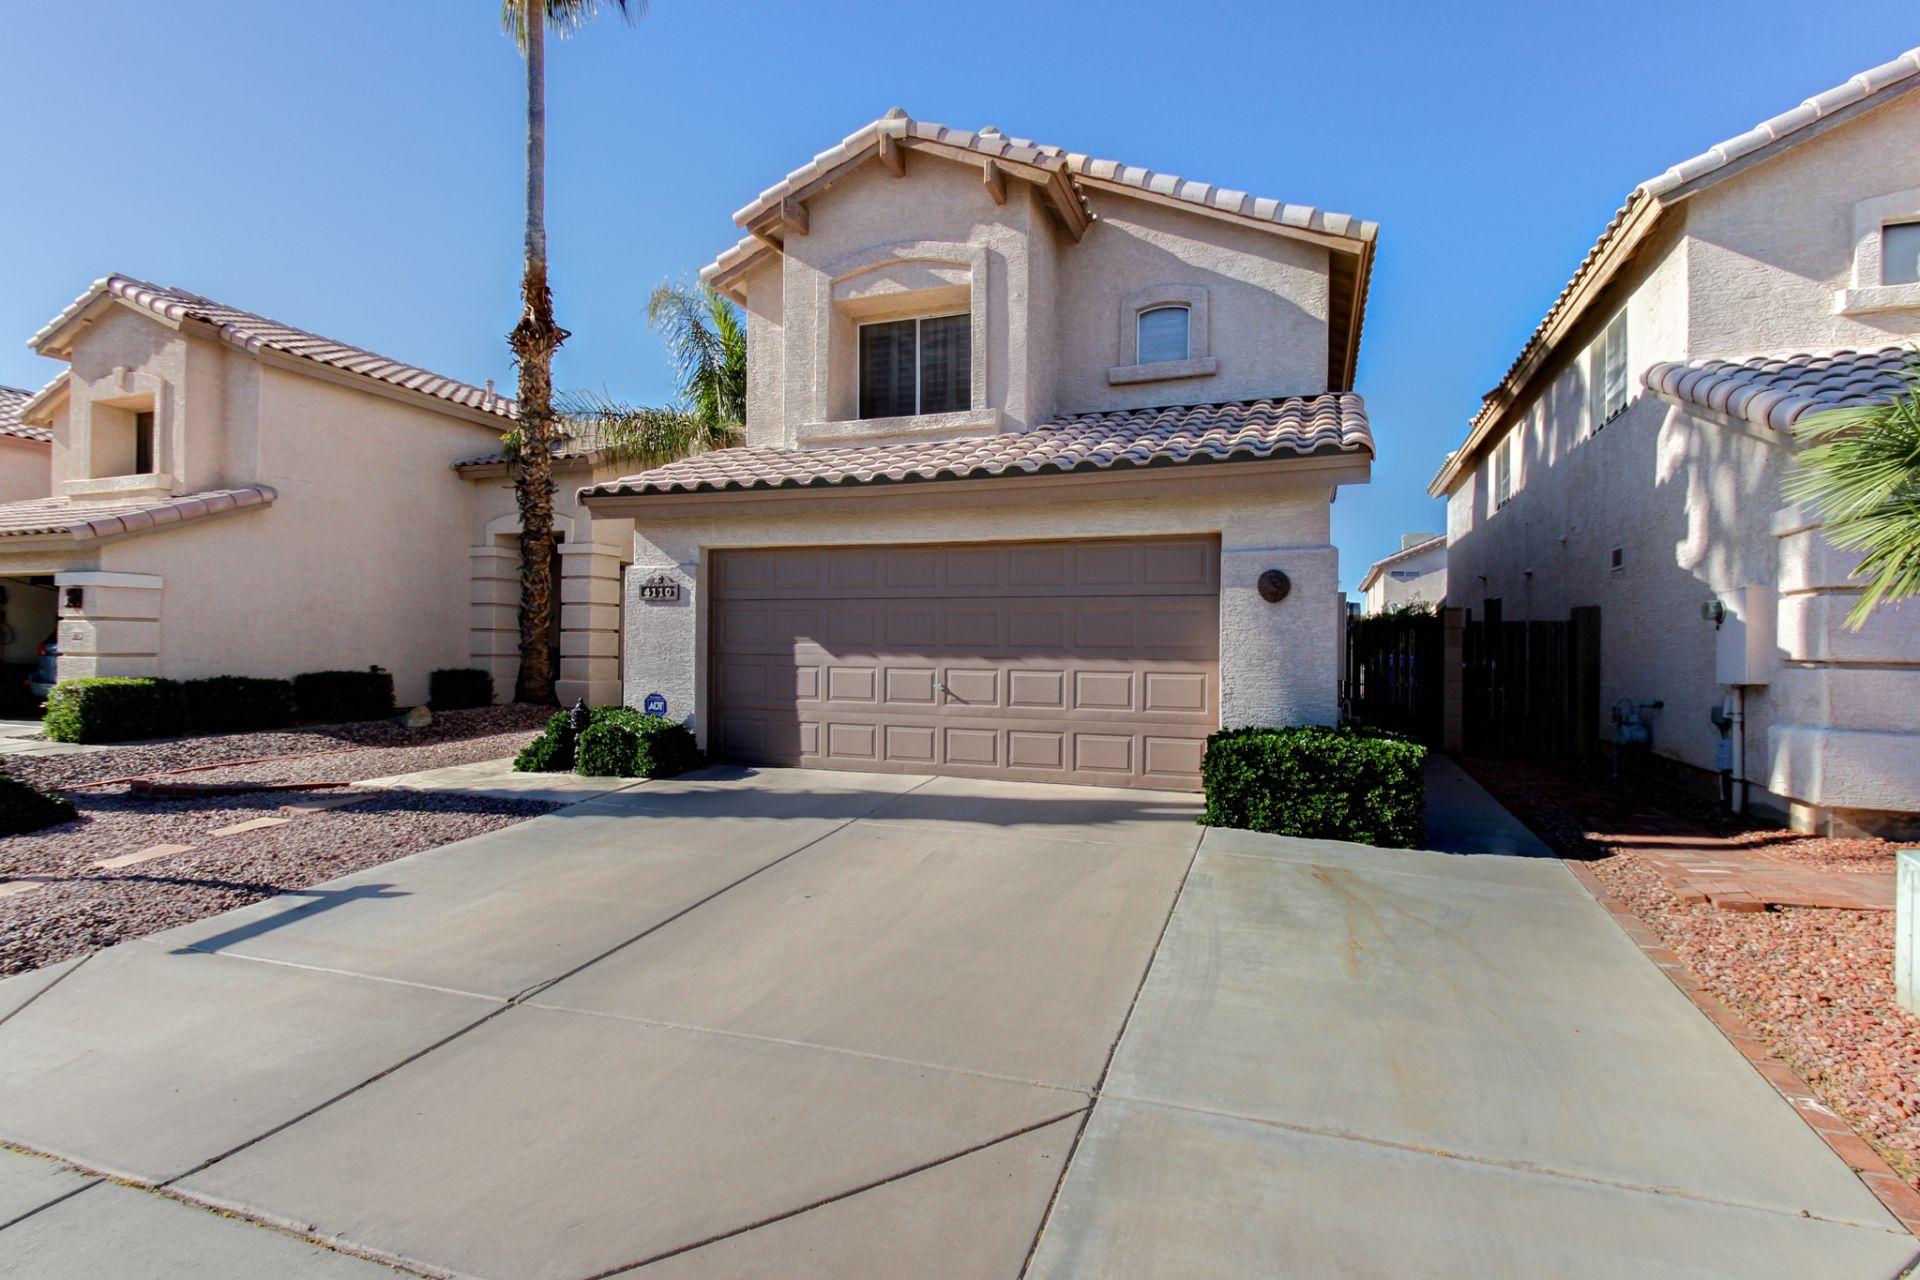 4110 E COOLBROOK AVE, Phoenix, AZ 85032